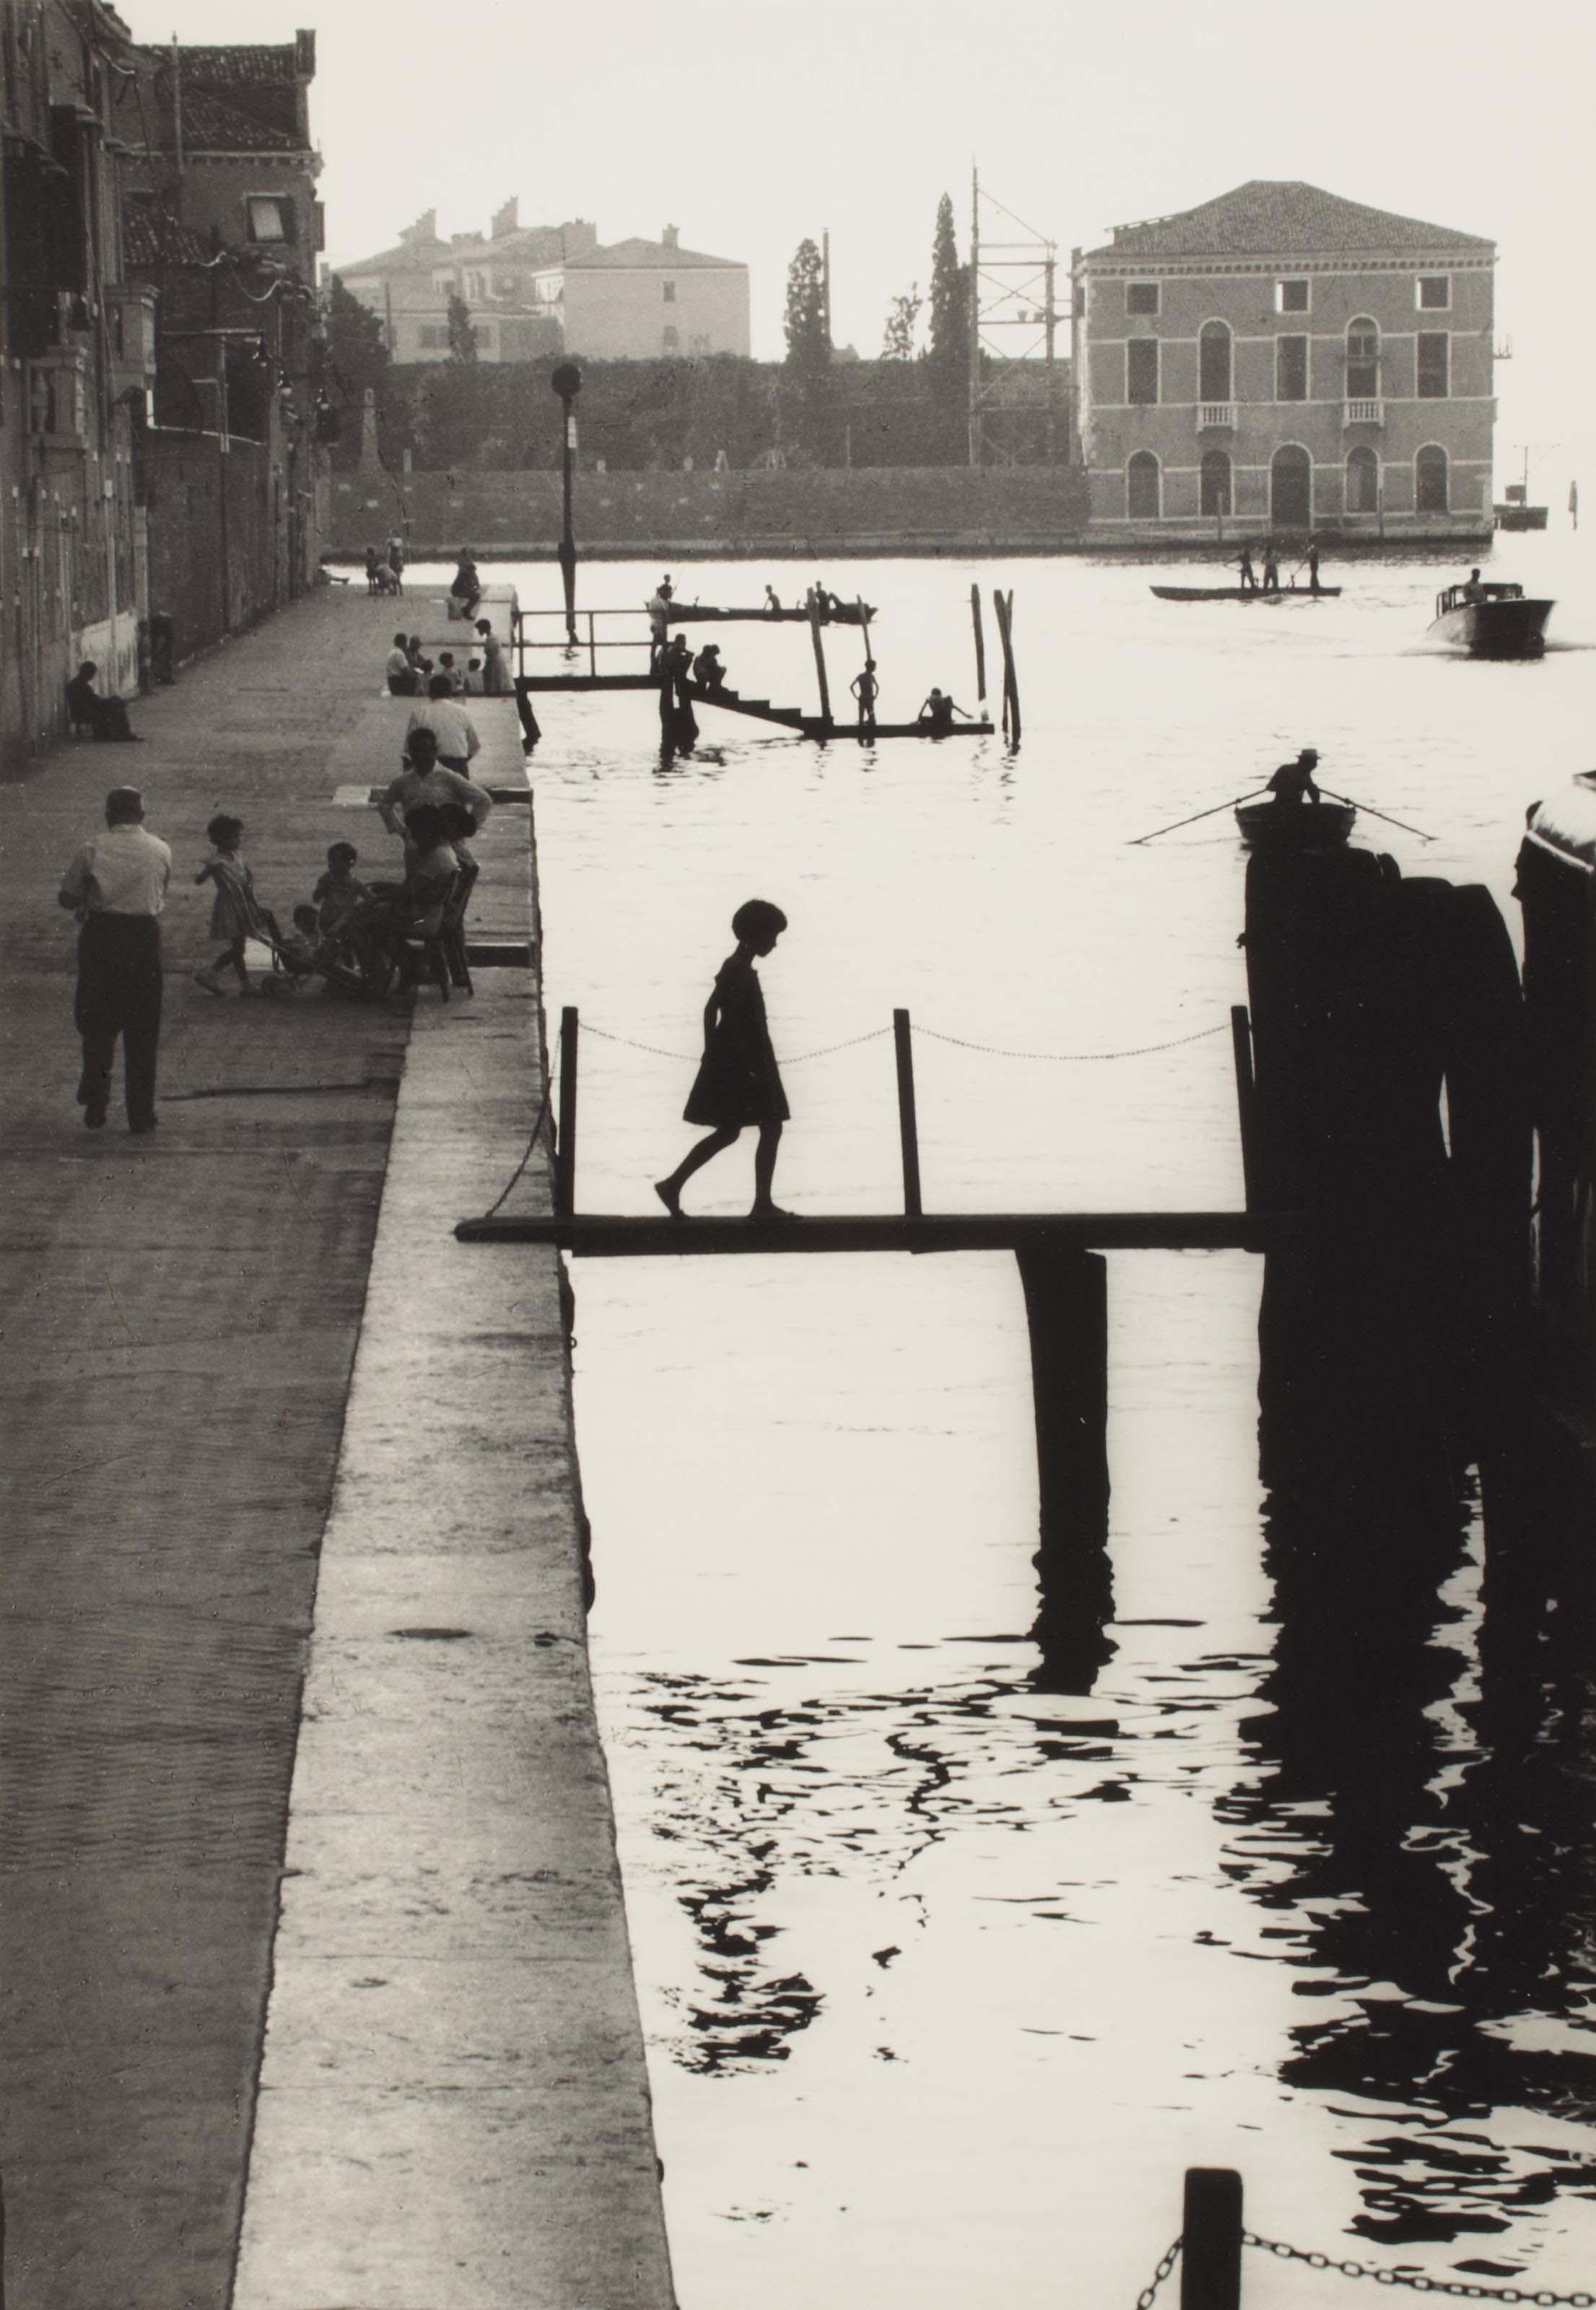 Fondamente Nuove, Venise, 1959